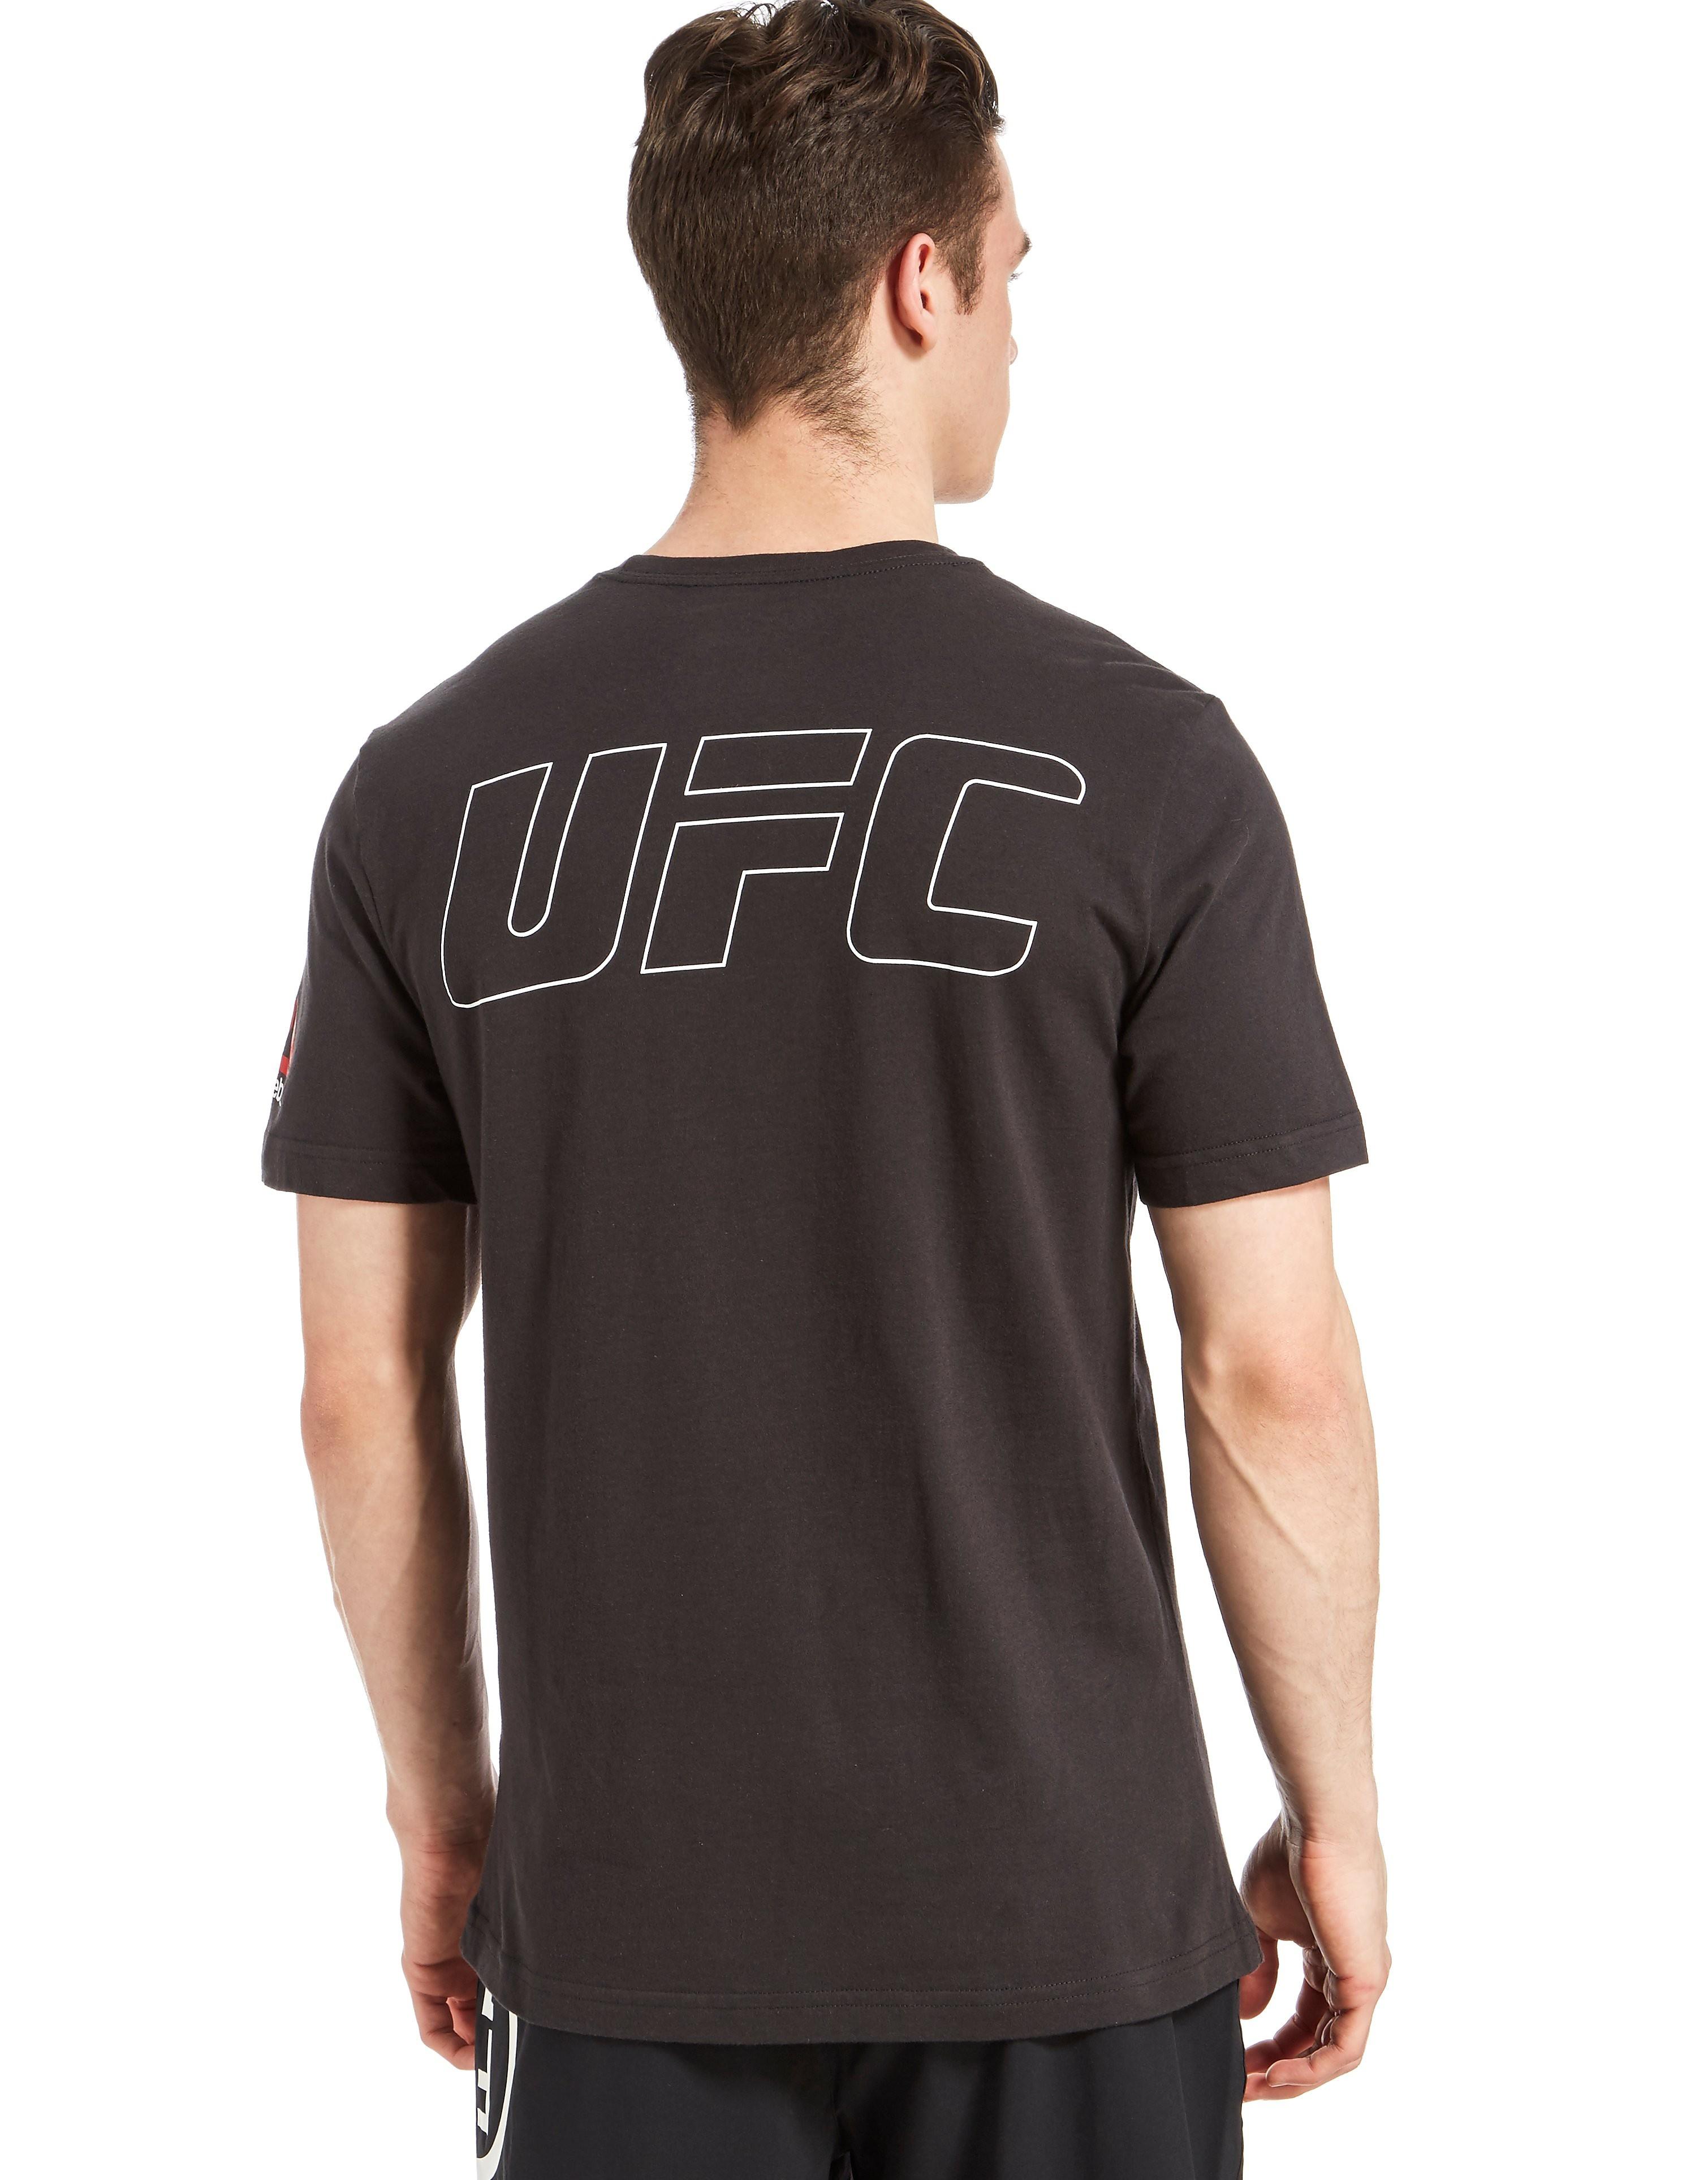 Reebok UFC Conor McGregor Fighter T-Shirt